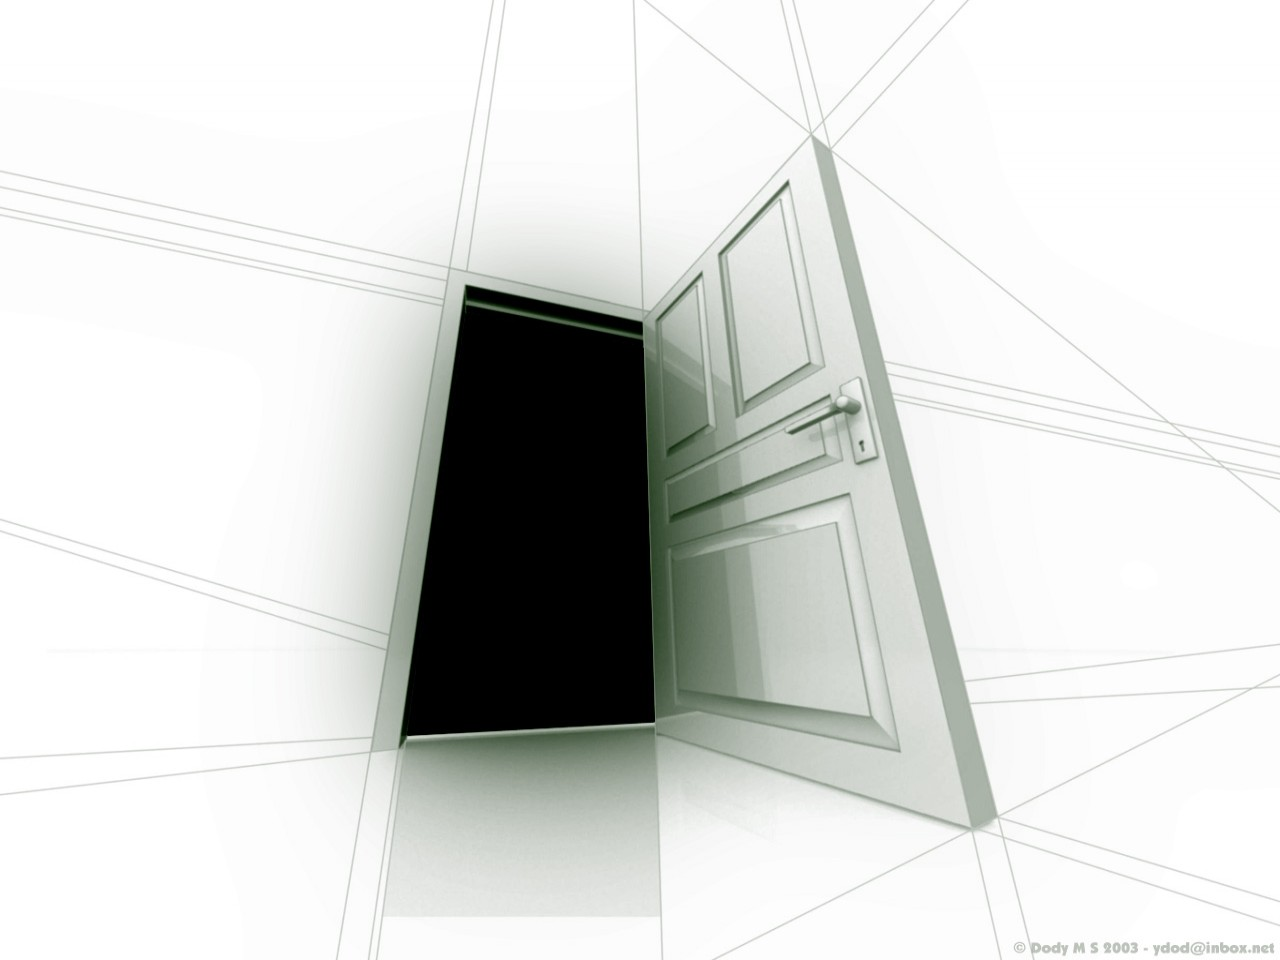 http://3.bp.blogspot.com/_xTRoyx0_2x8/TKdLiR5bNoI/AAAAAAAAABc/VV-NbQNnqNs/s1600/822WallpapersAbstractos.jpg